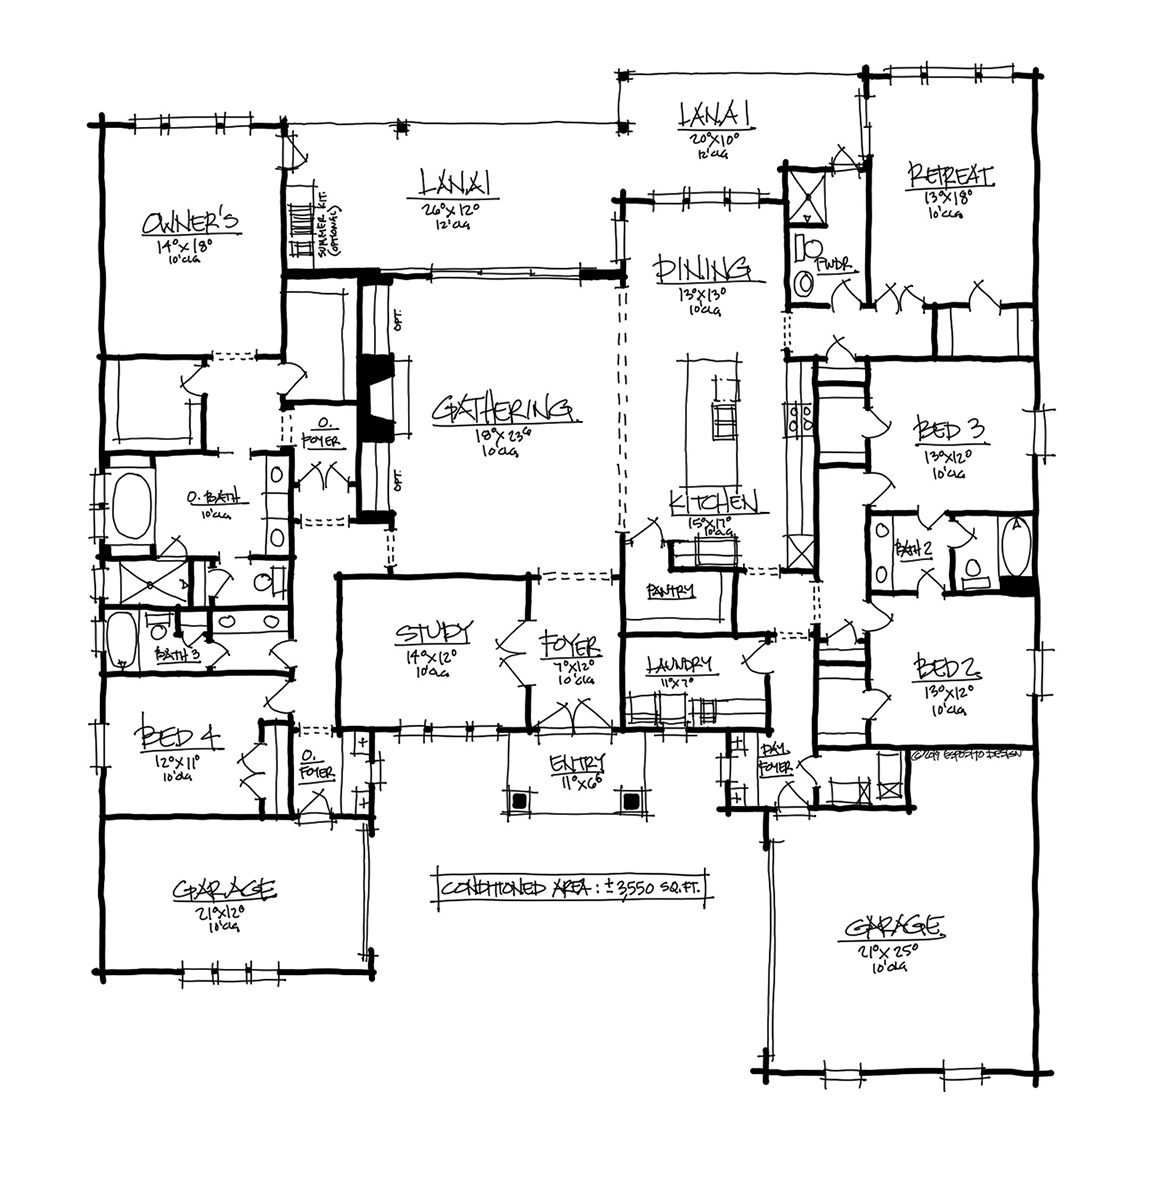 matheson floorplan specs